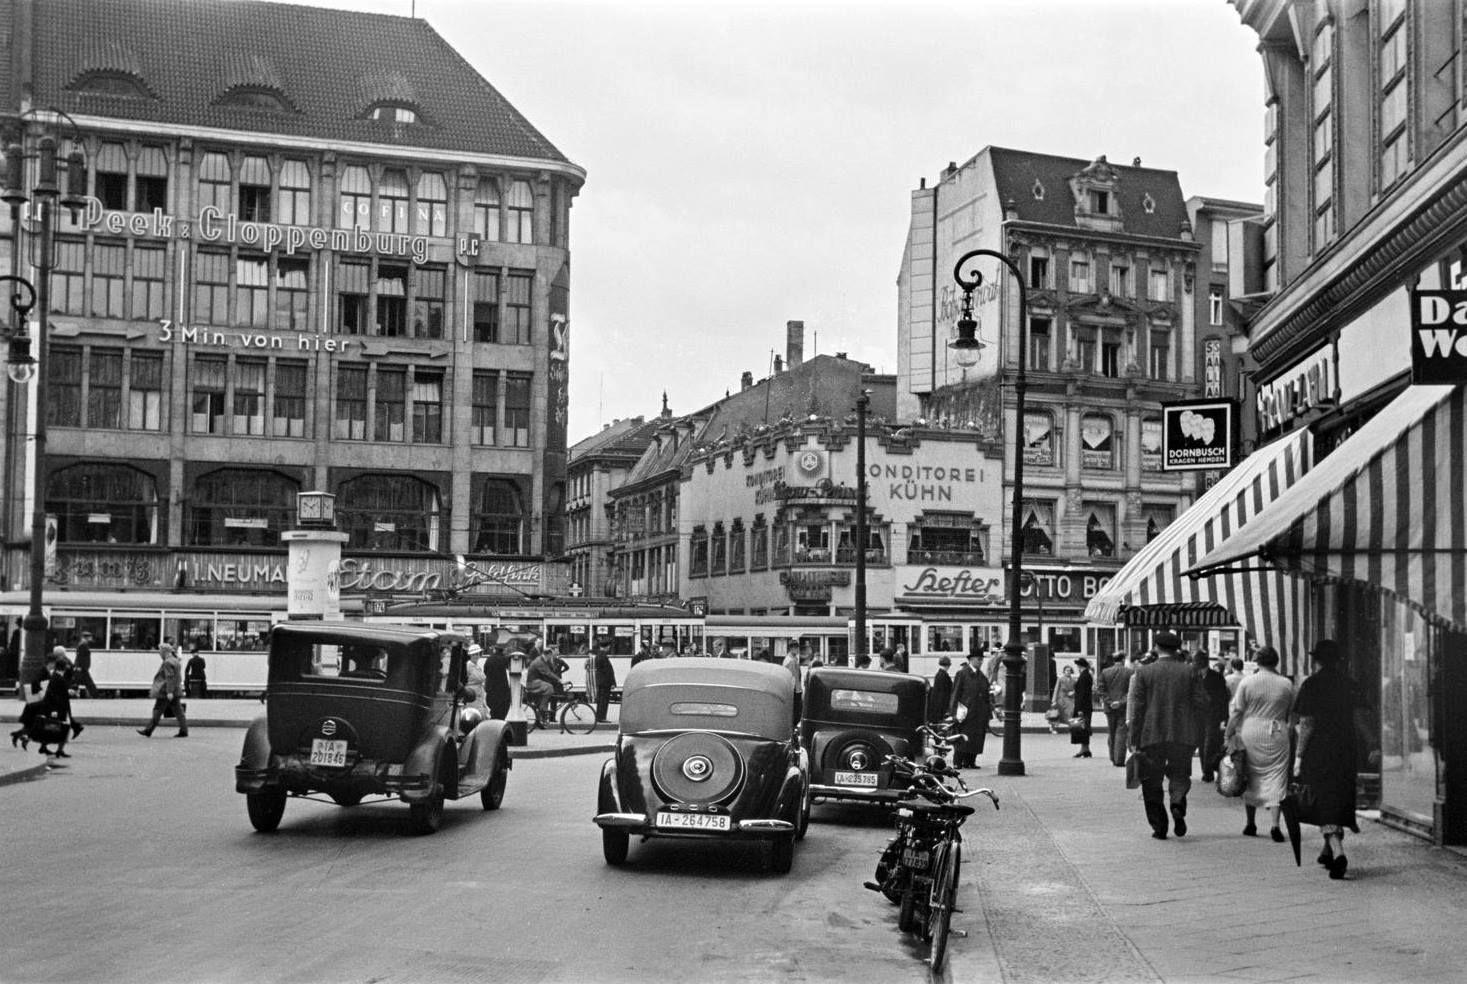 Berlin 1937 Blick Uber Den Spittelmarkt Niederwallstr Croner Harry Deutschland Berlin Geschichte Leipziger Platz